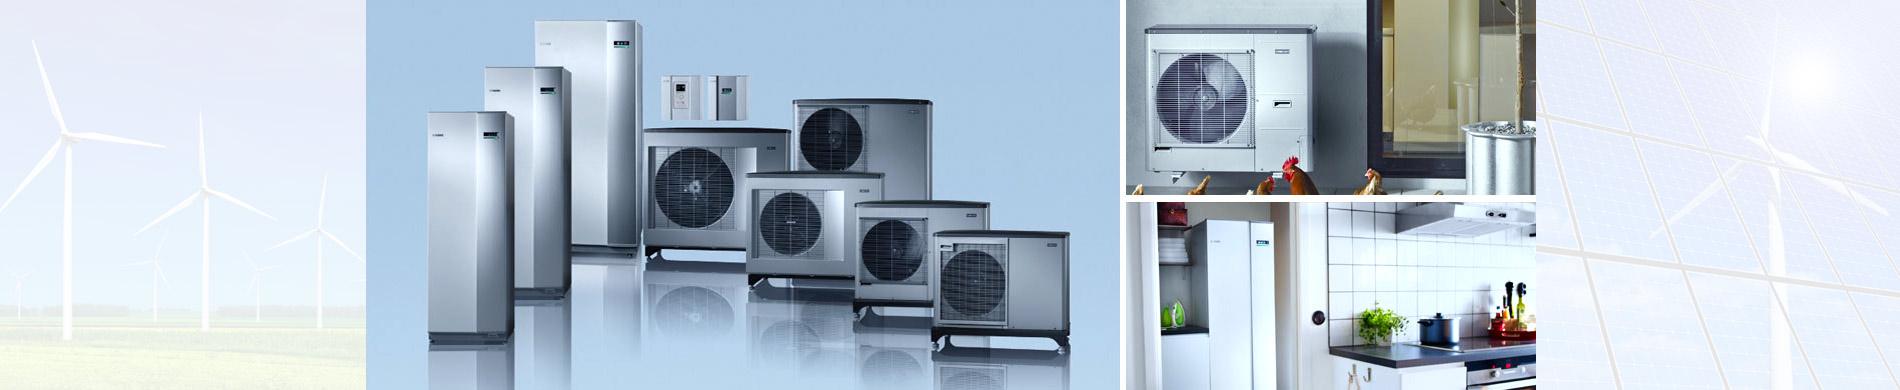 CEI-NI-Heat-Pumps